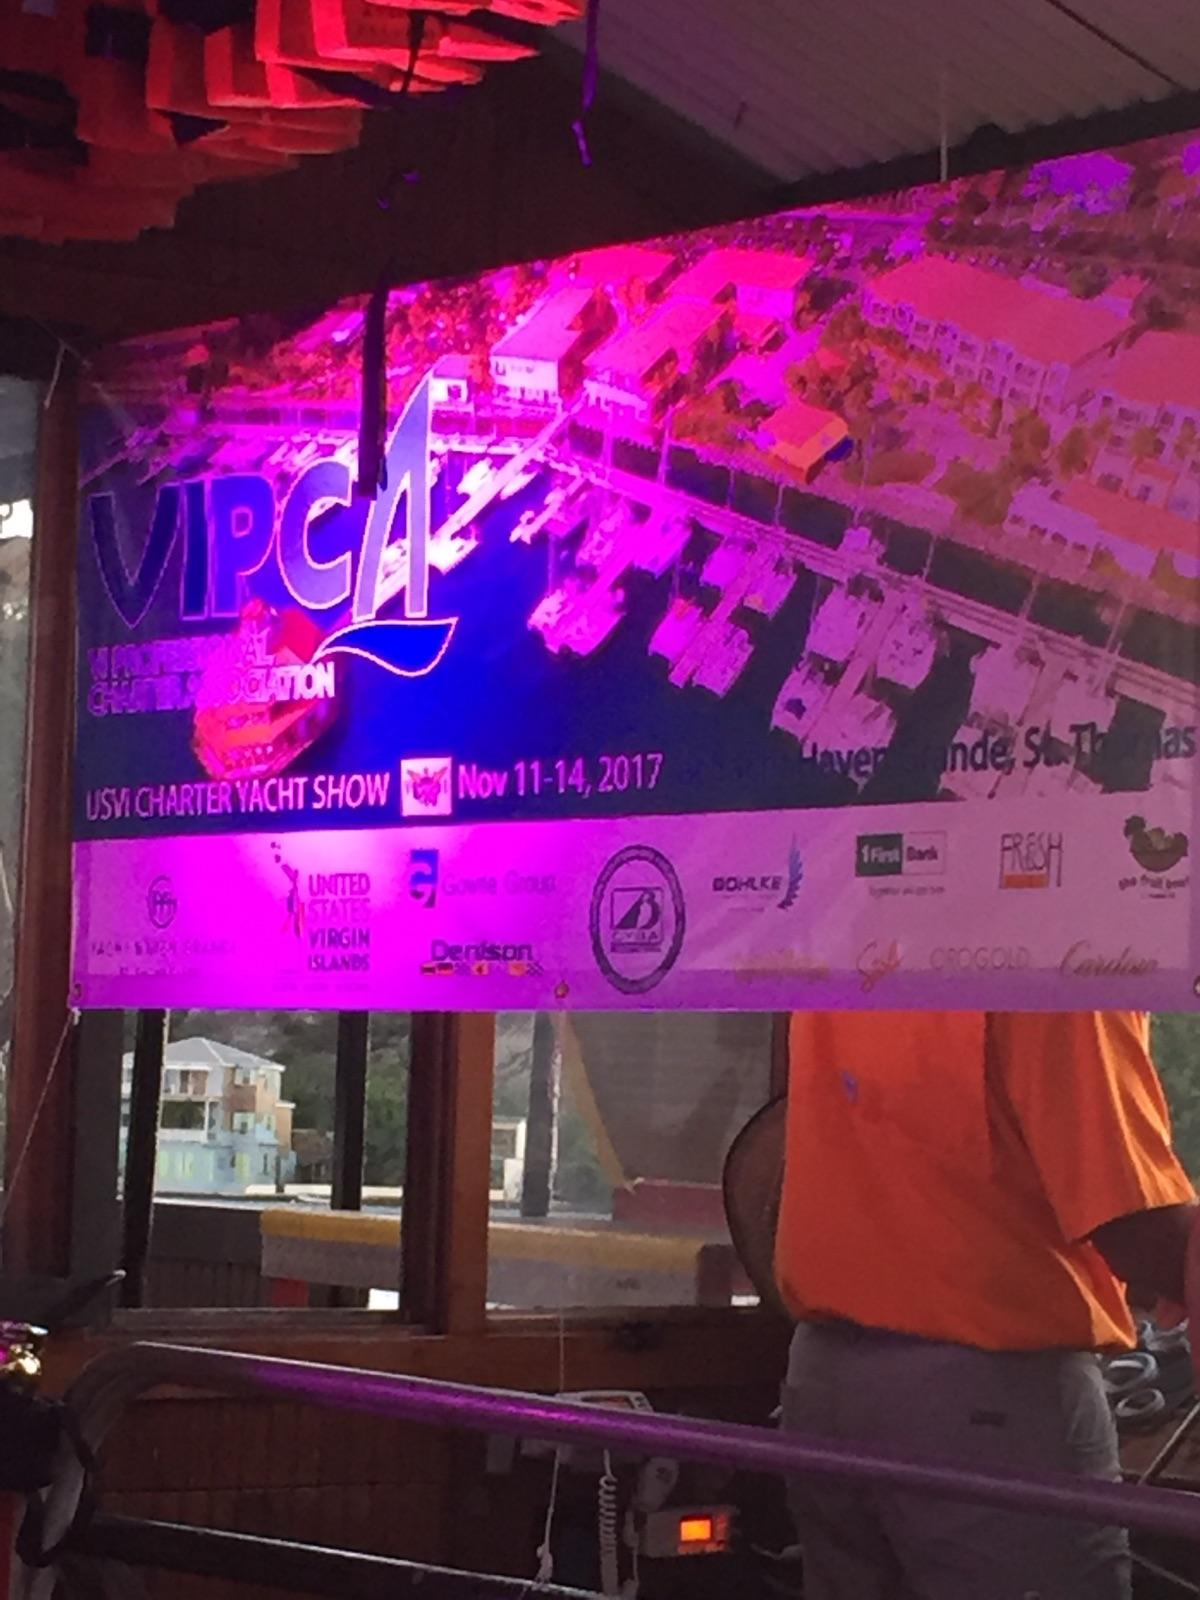 VIPCA welcome banner